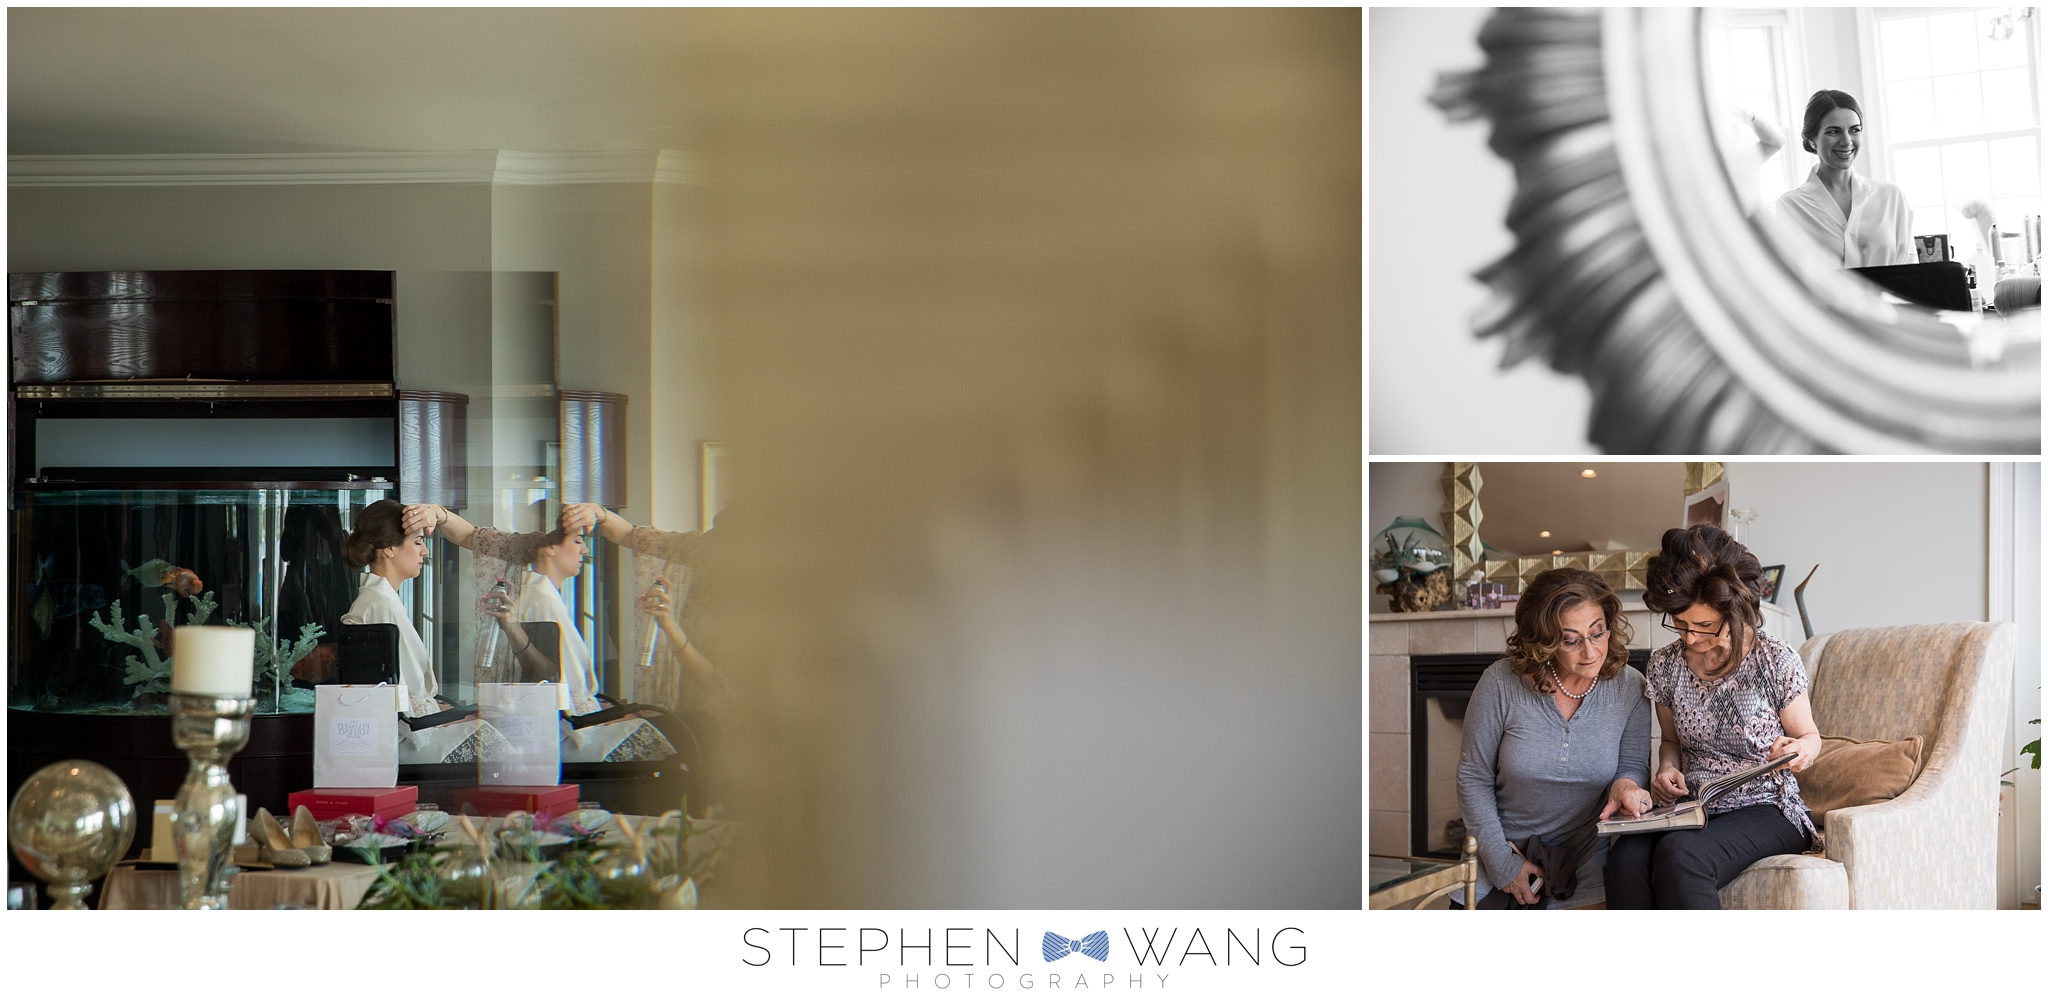 Stephen Wang Photography Shorehaven Norwalk CT Wedding Photographer connecticut shoreline shore haven - 7.jpg